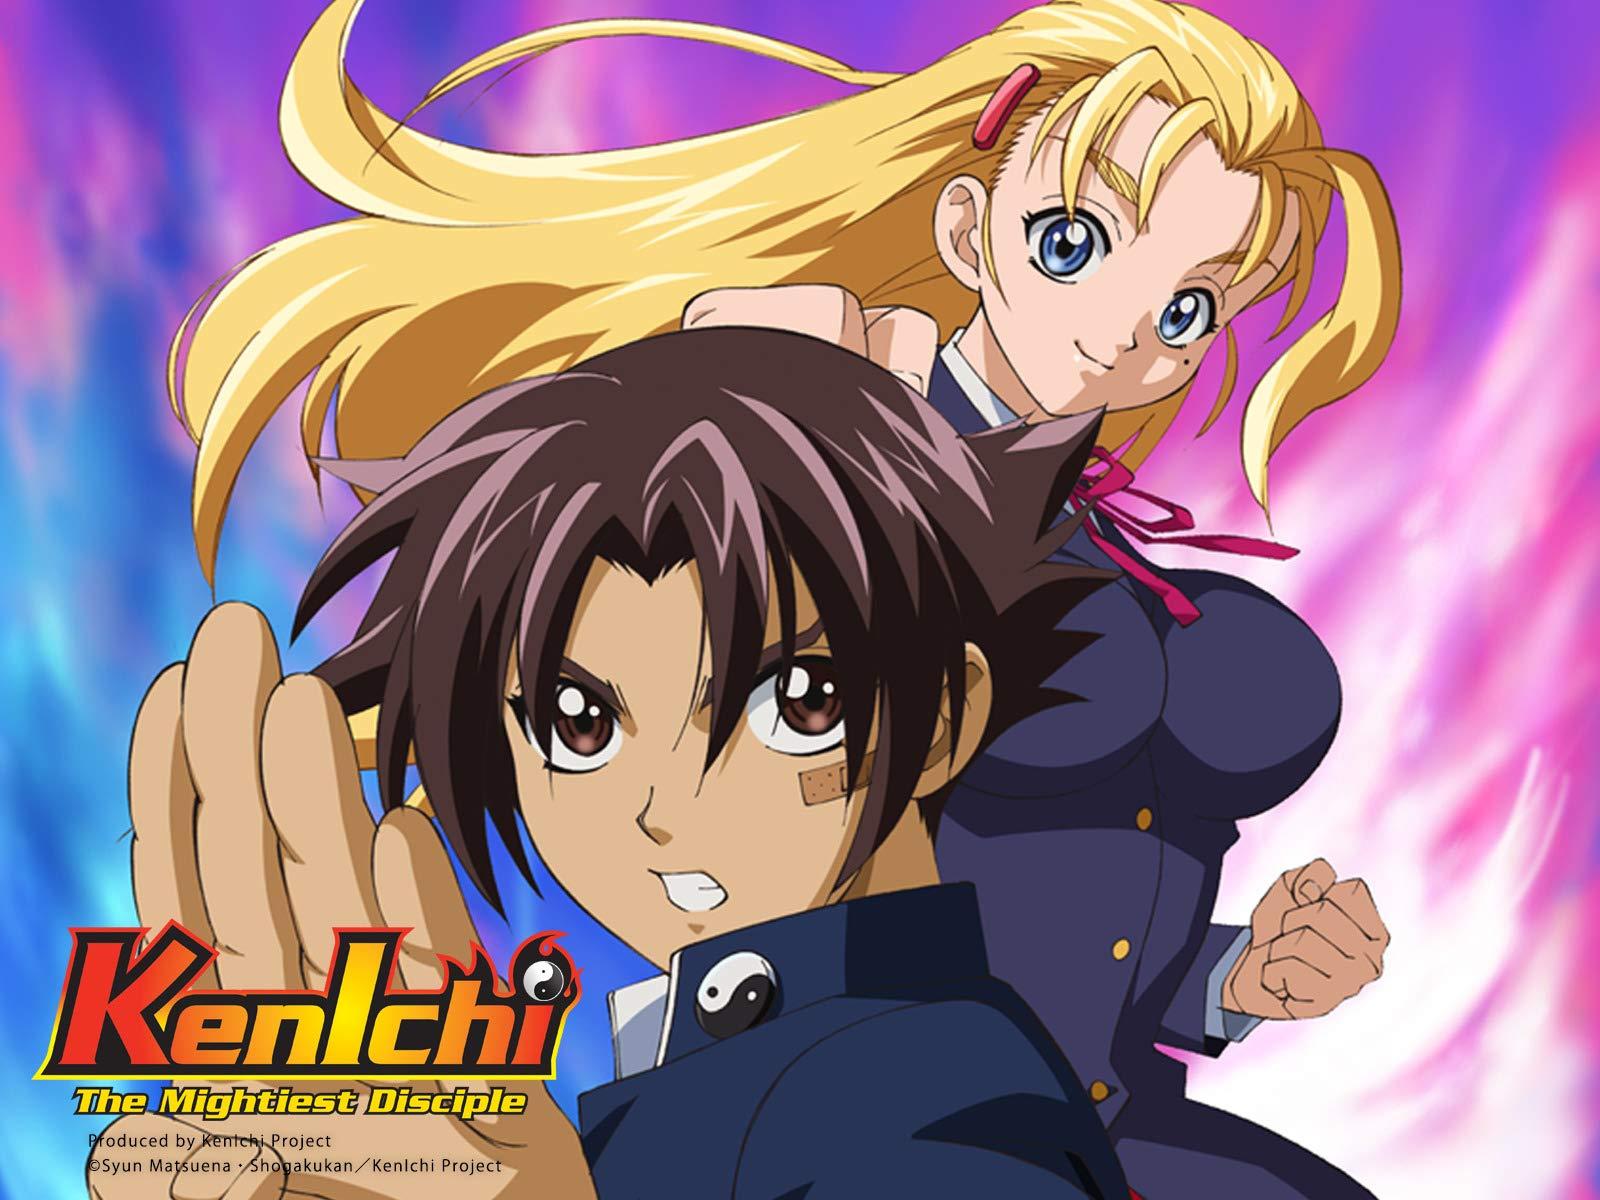 KenIchi: The Mightiest Disciple (English Dub) - Season 4